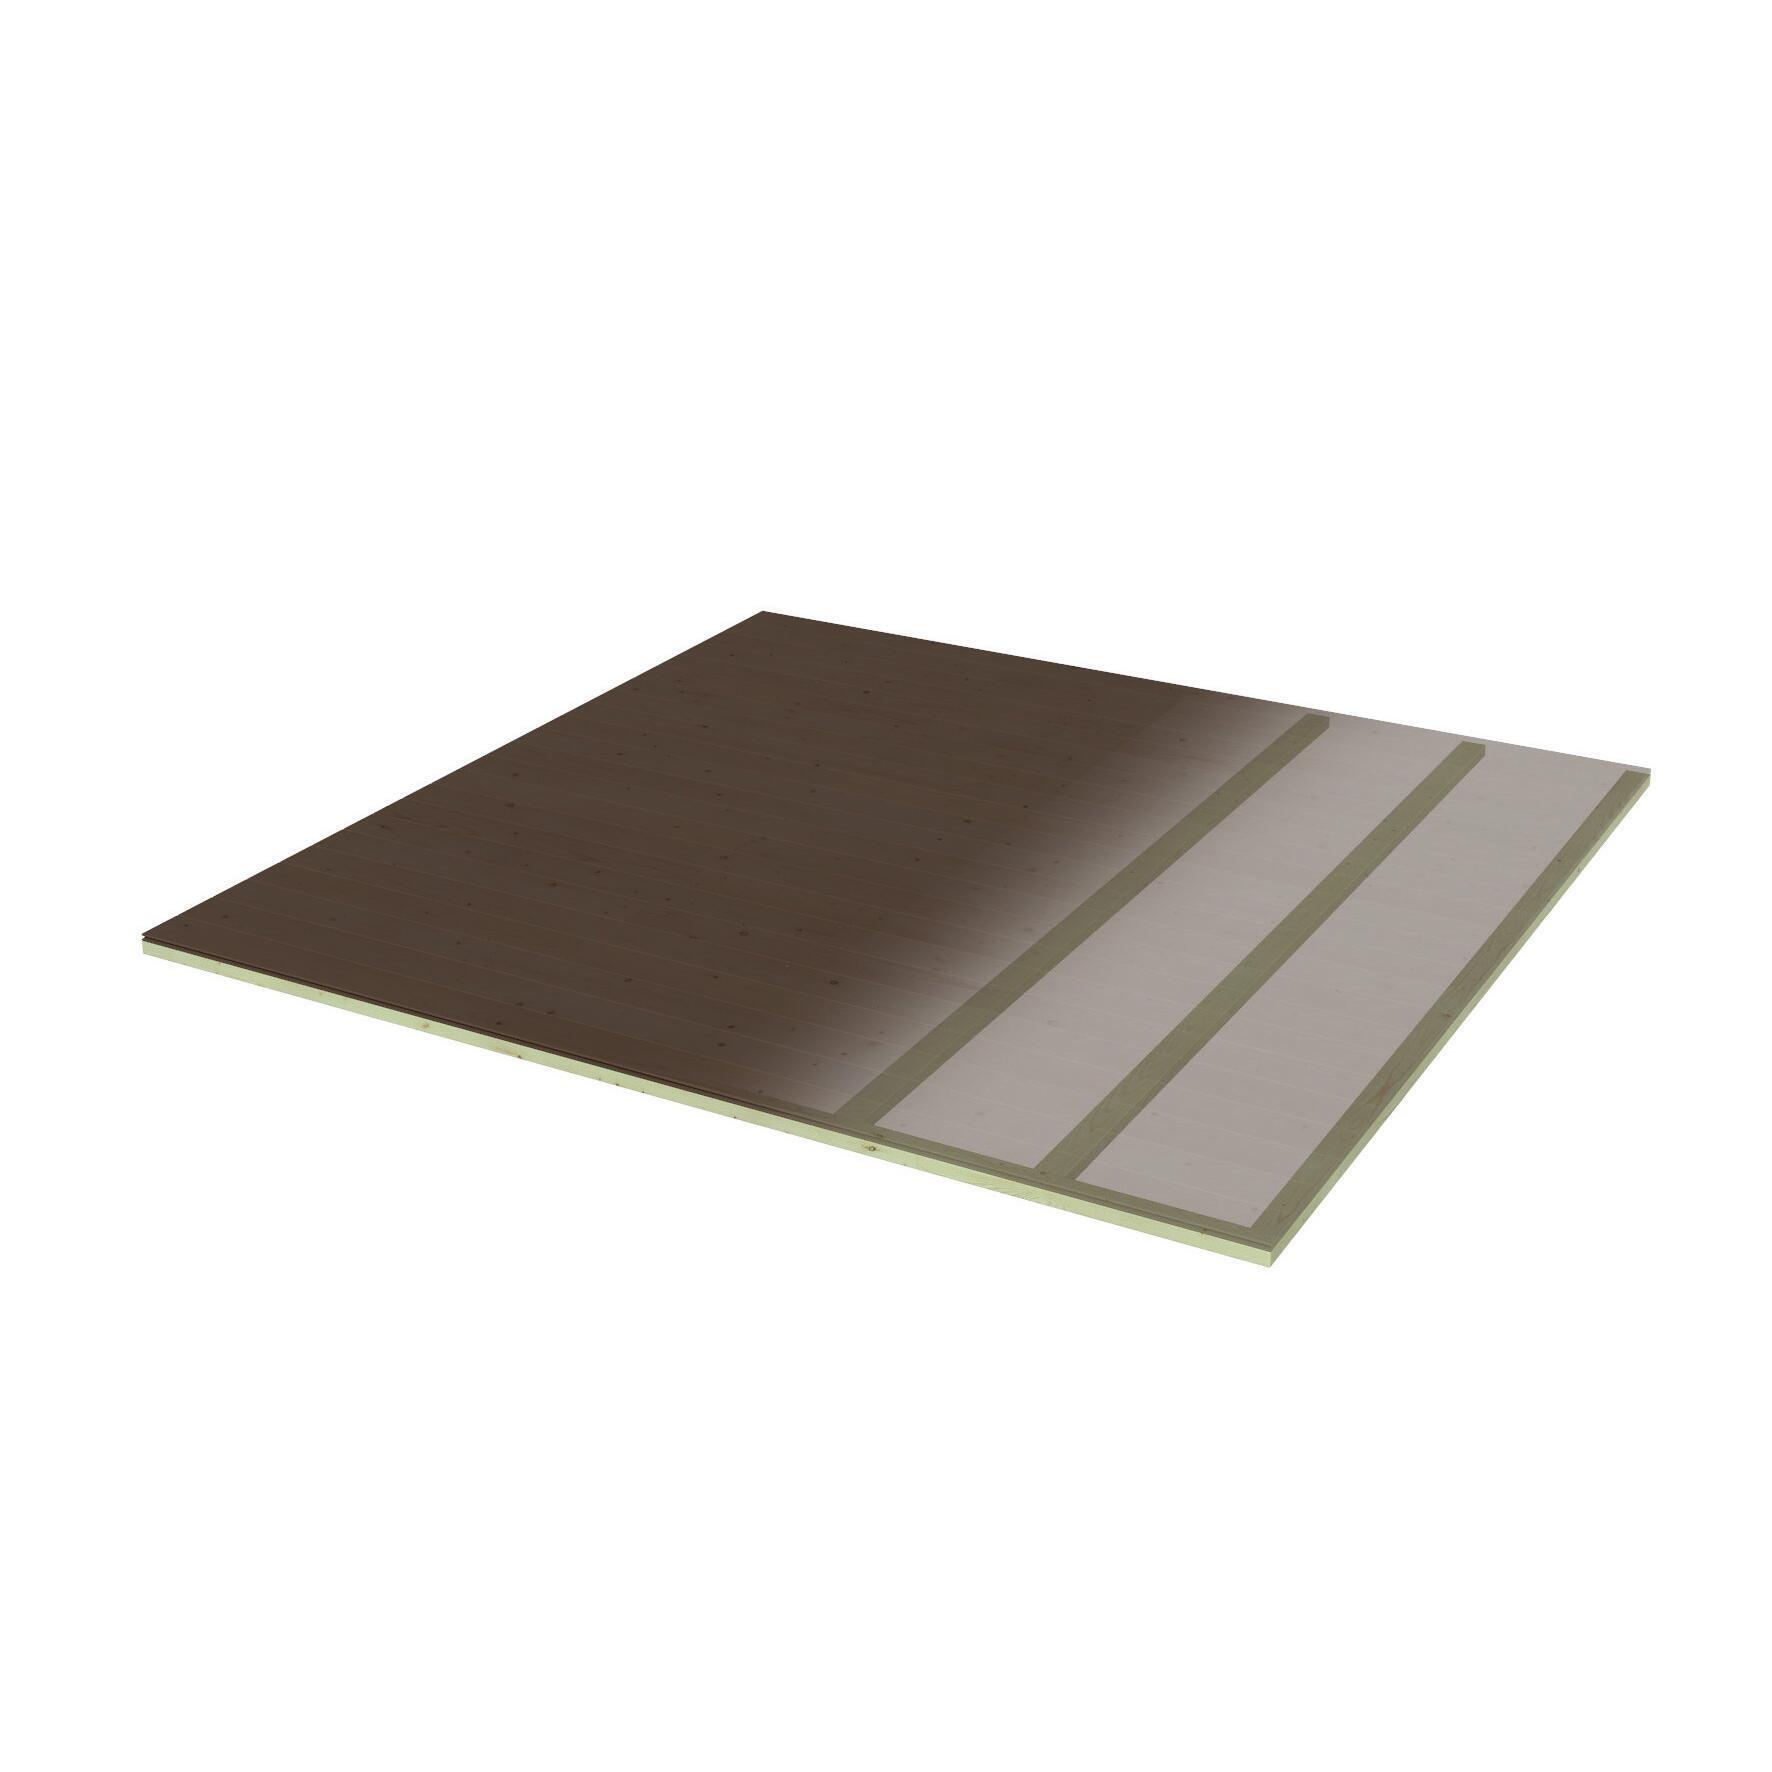 Pavimento per casetta da giardino Viola DECOR ET JARDIN 241.4 x 250 x 45 cm - 1